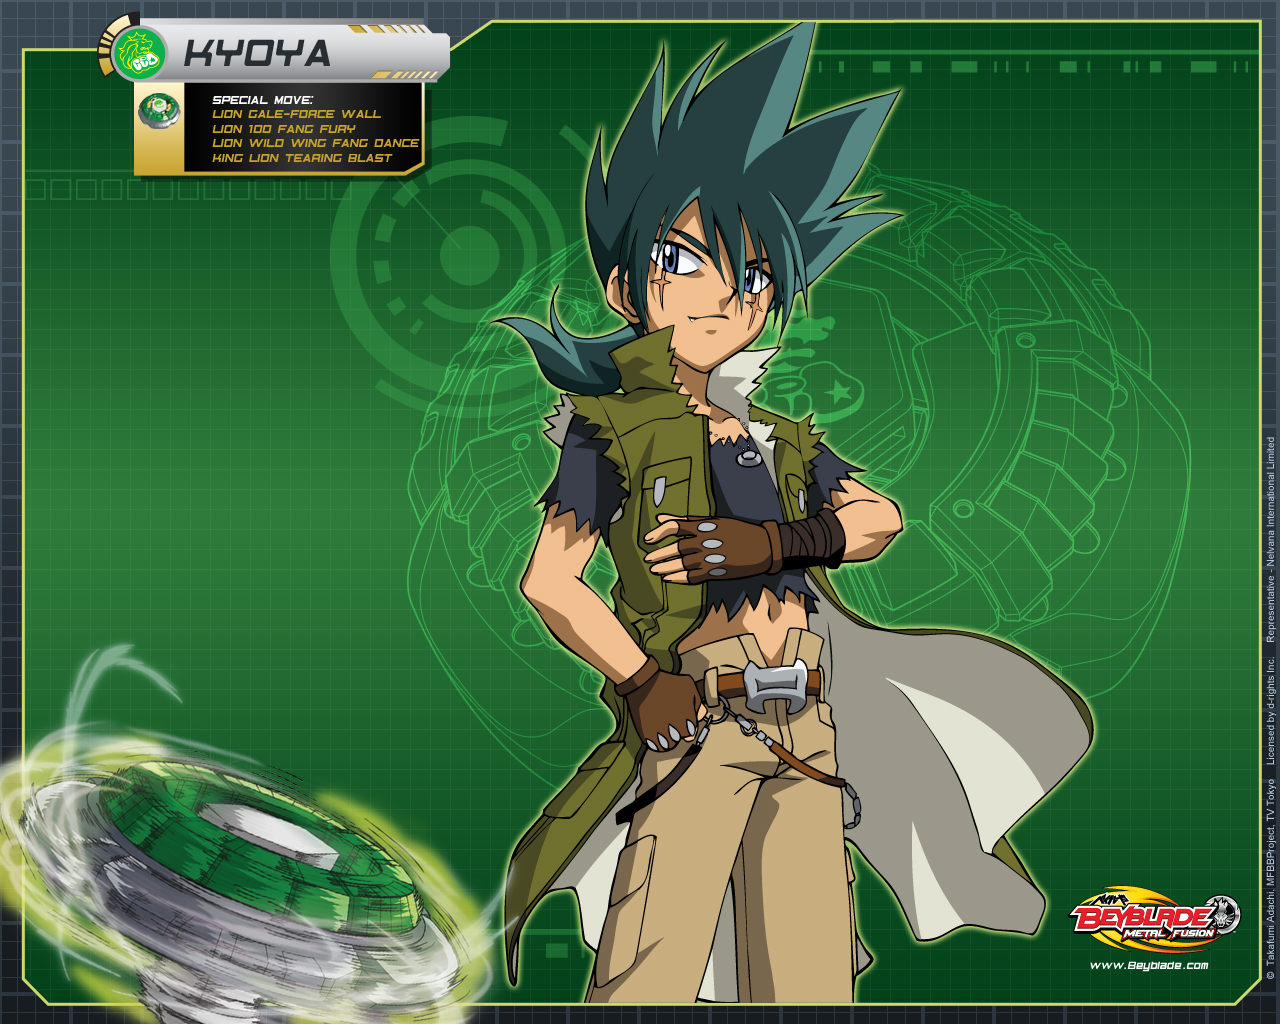 File:Kyoya.jpg